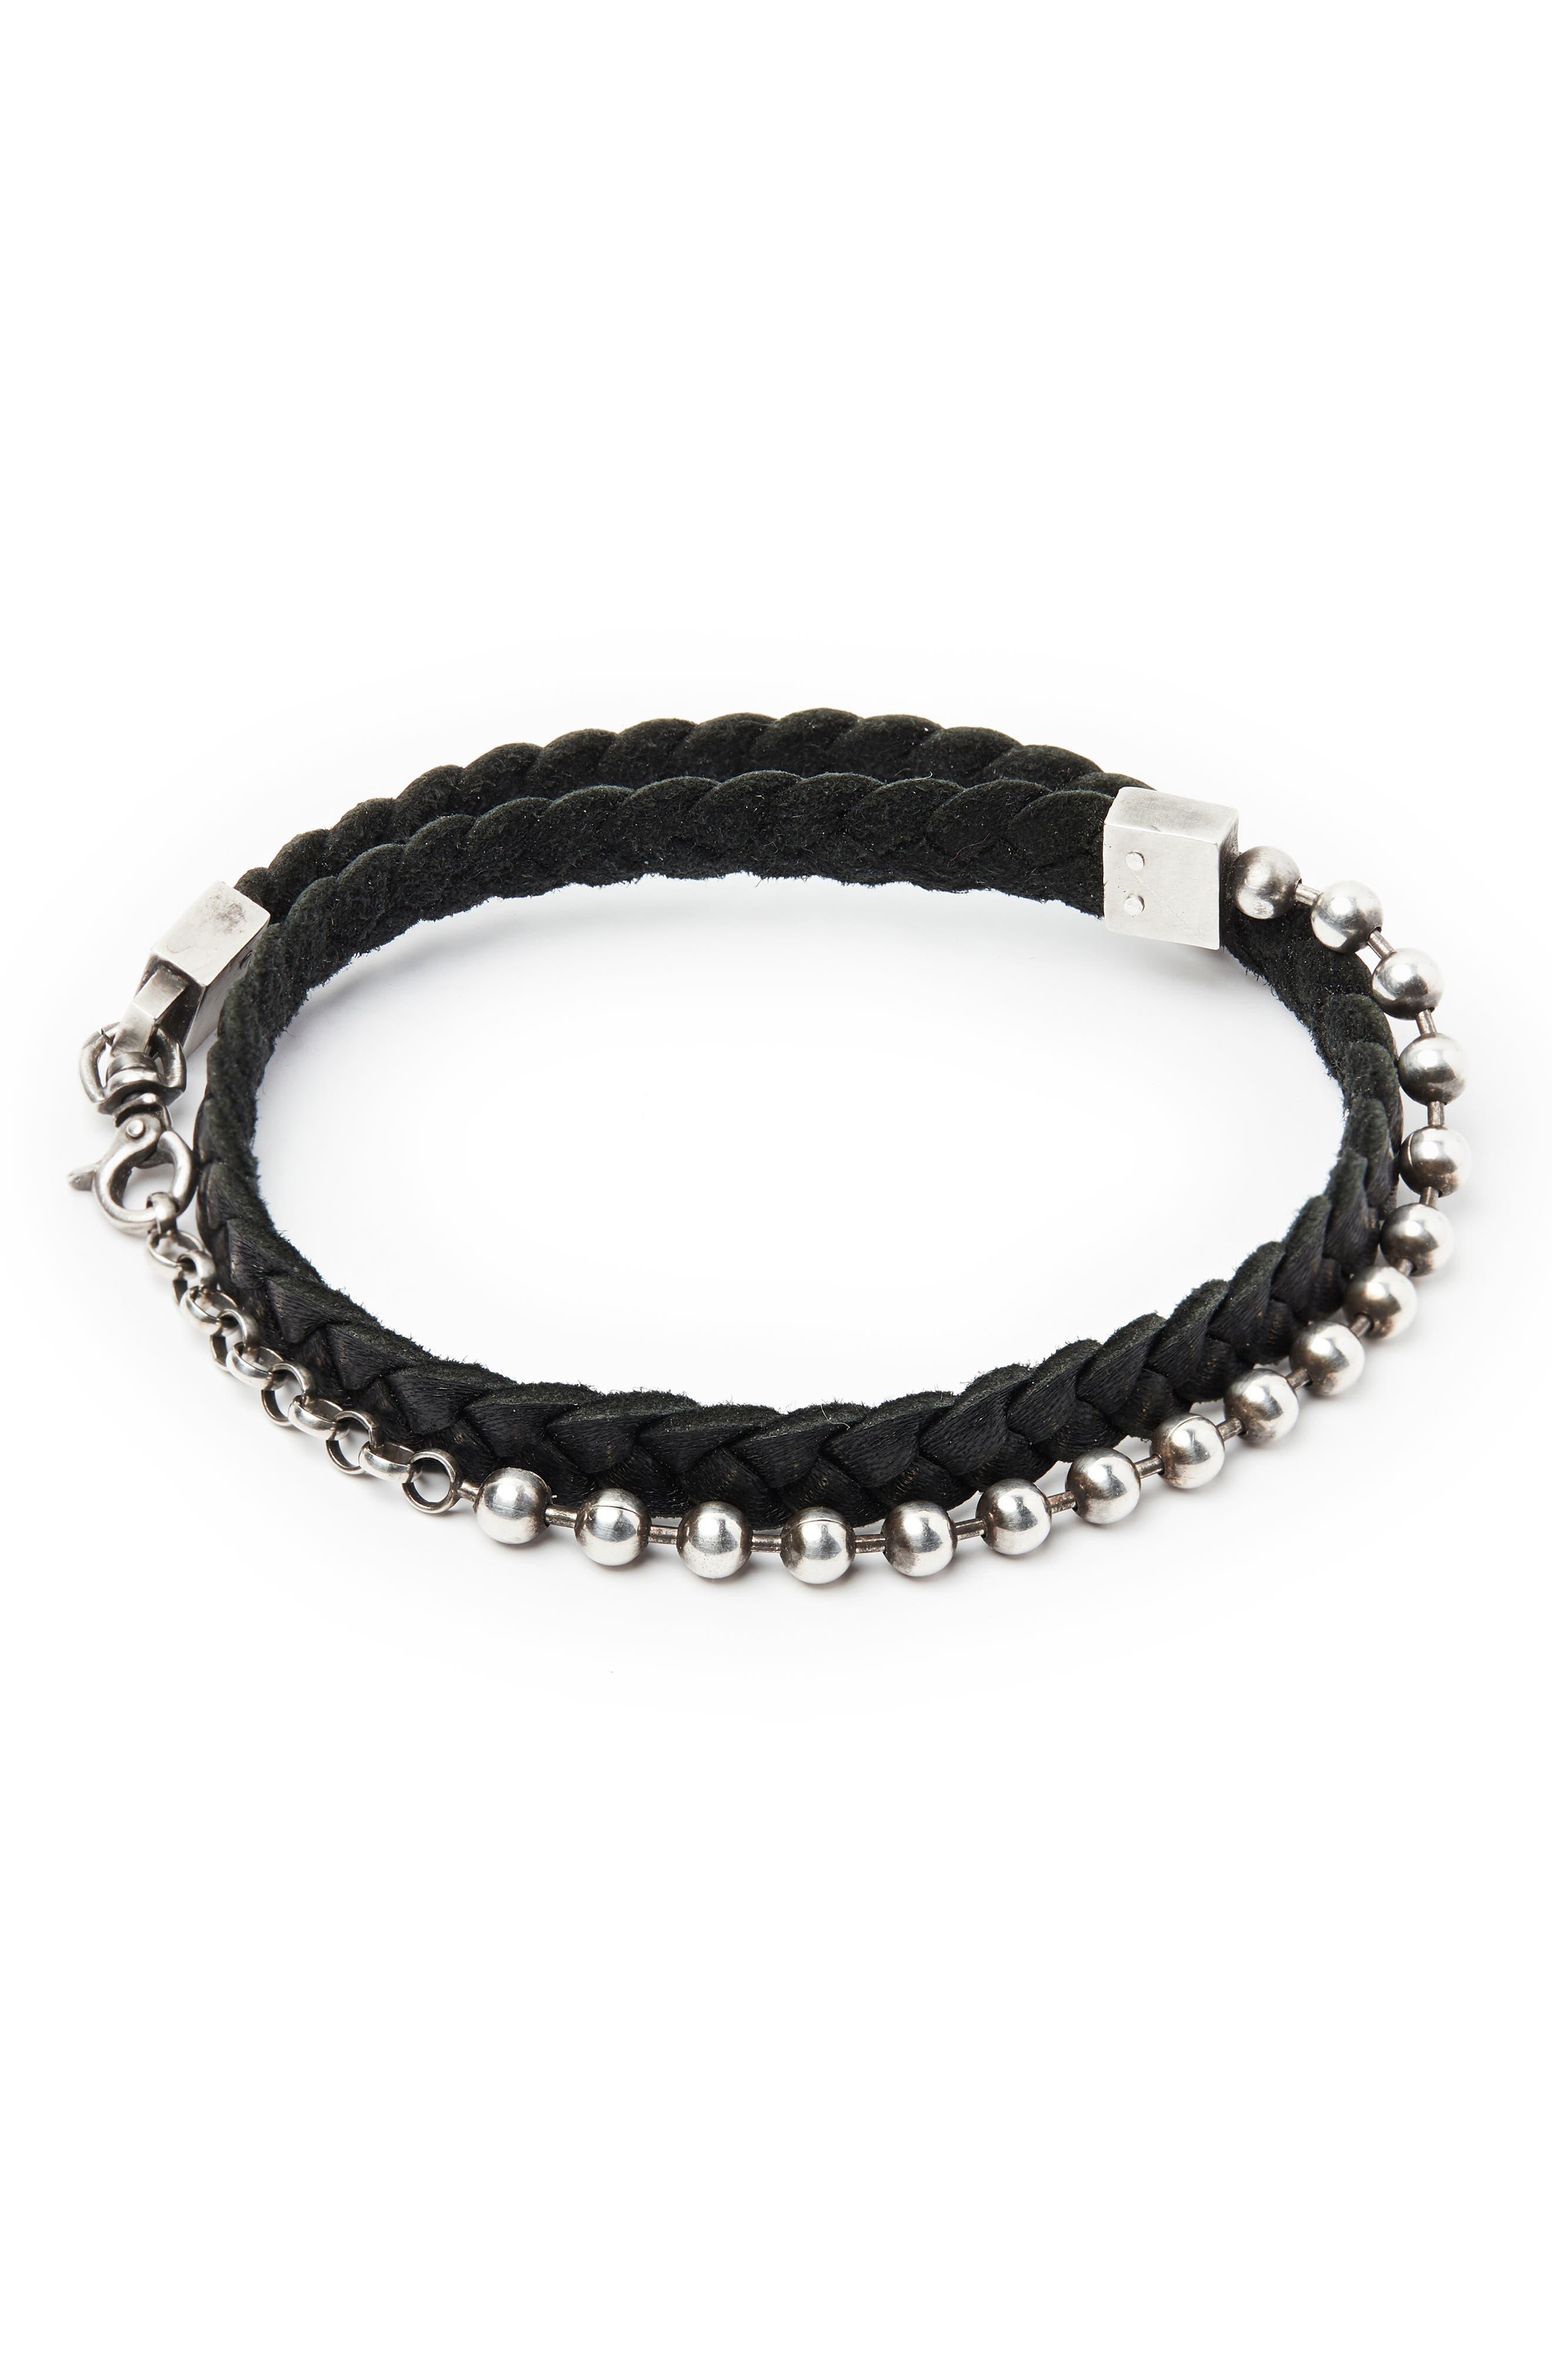 Leather & Sterling Silver Bracelet,                             Main thumbnail 1, color,                             SILVER/ BLACK